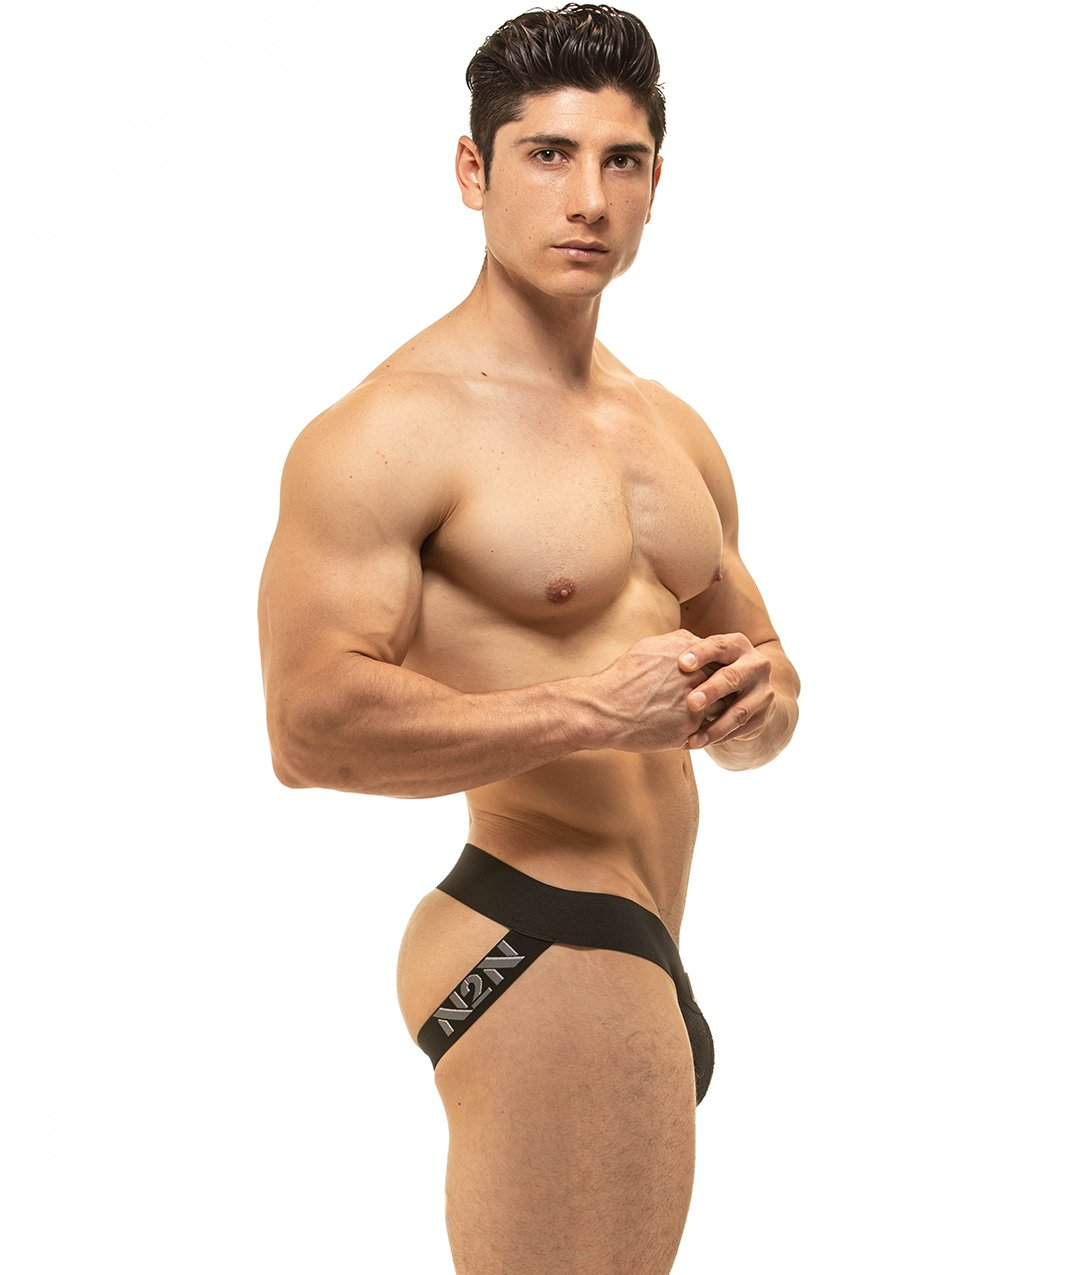 Jockstrap Wednesday - N2N Bodywear Mercury Jock